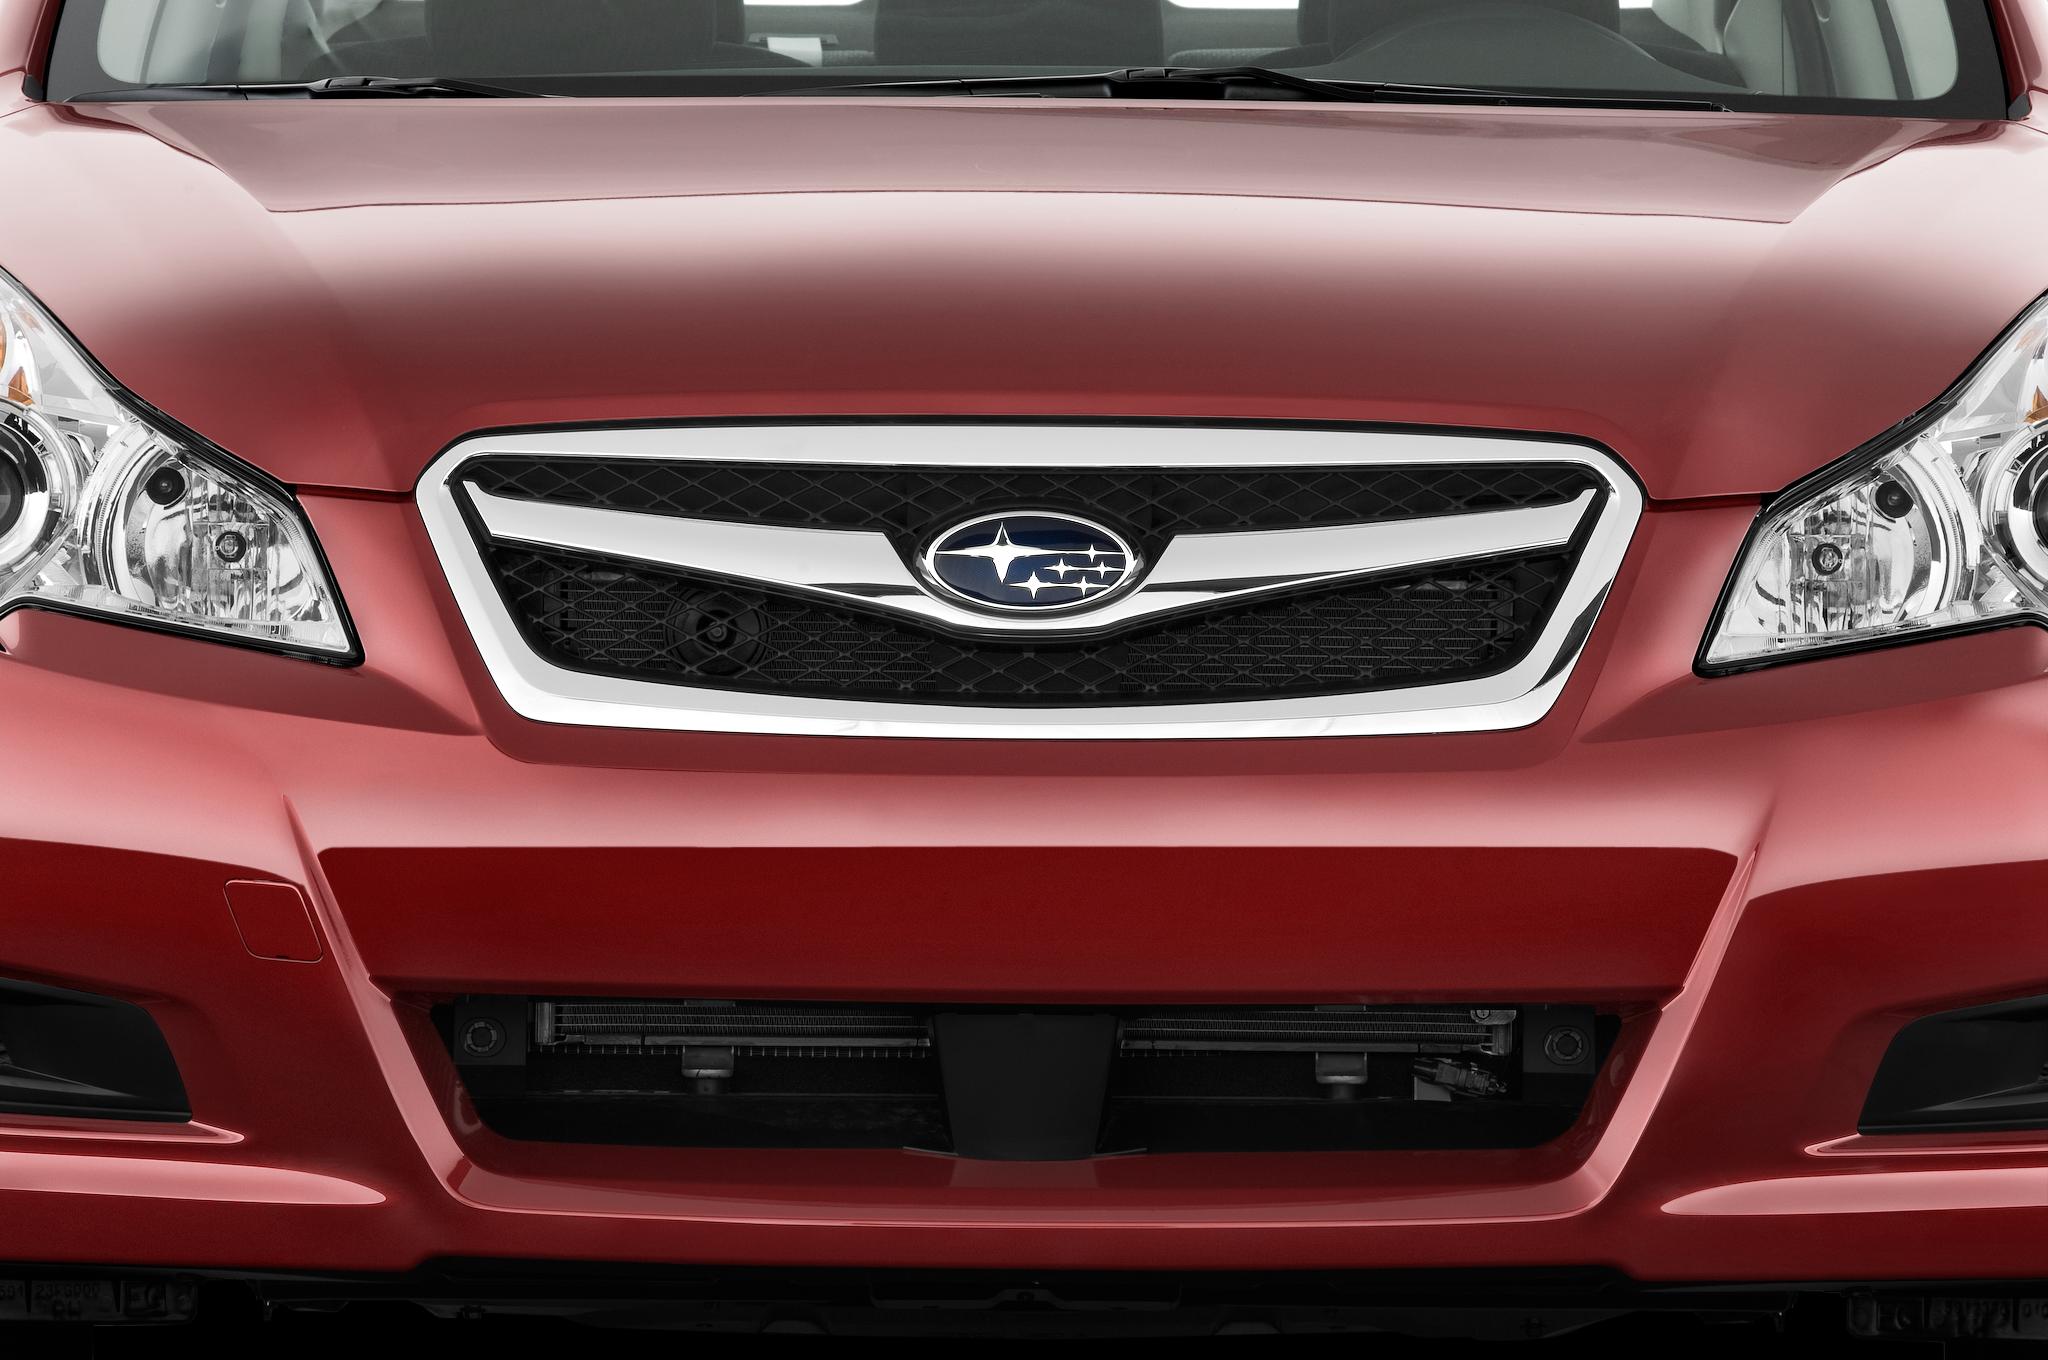 Subaru Legacy 3.6 R >> 2012 Subaru Legacy 3.6R Limited - Automobile Magazine